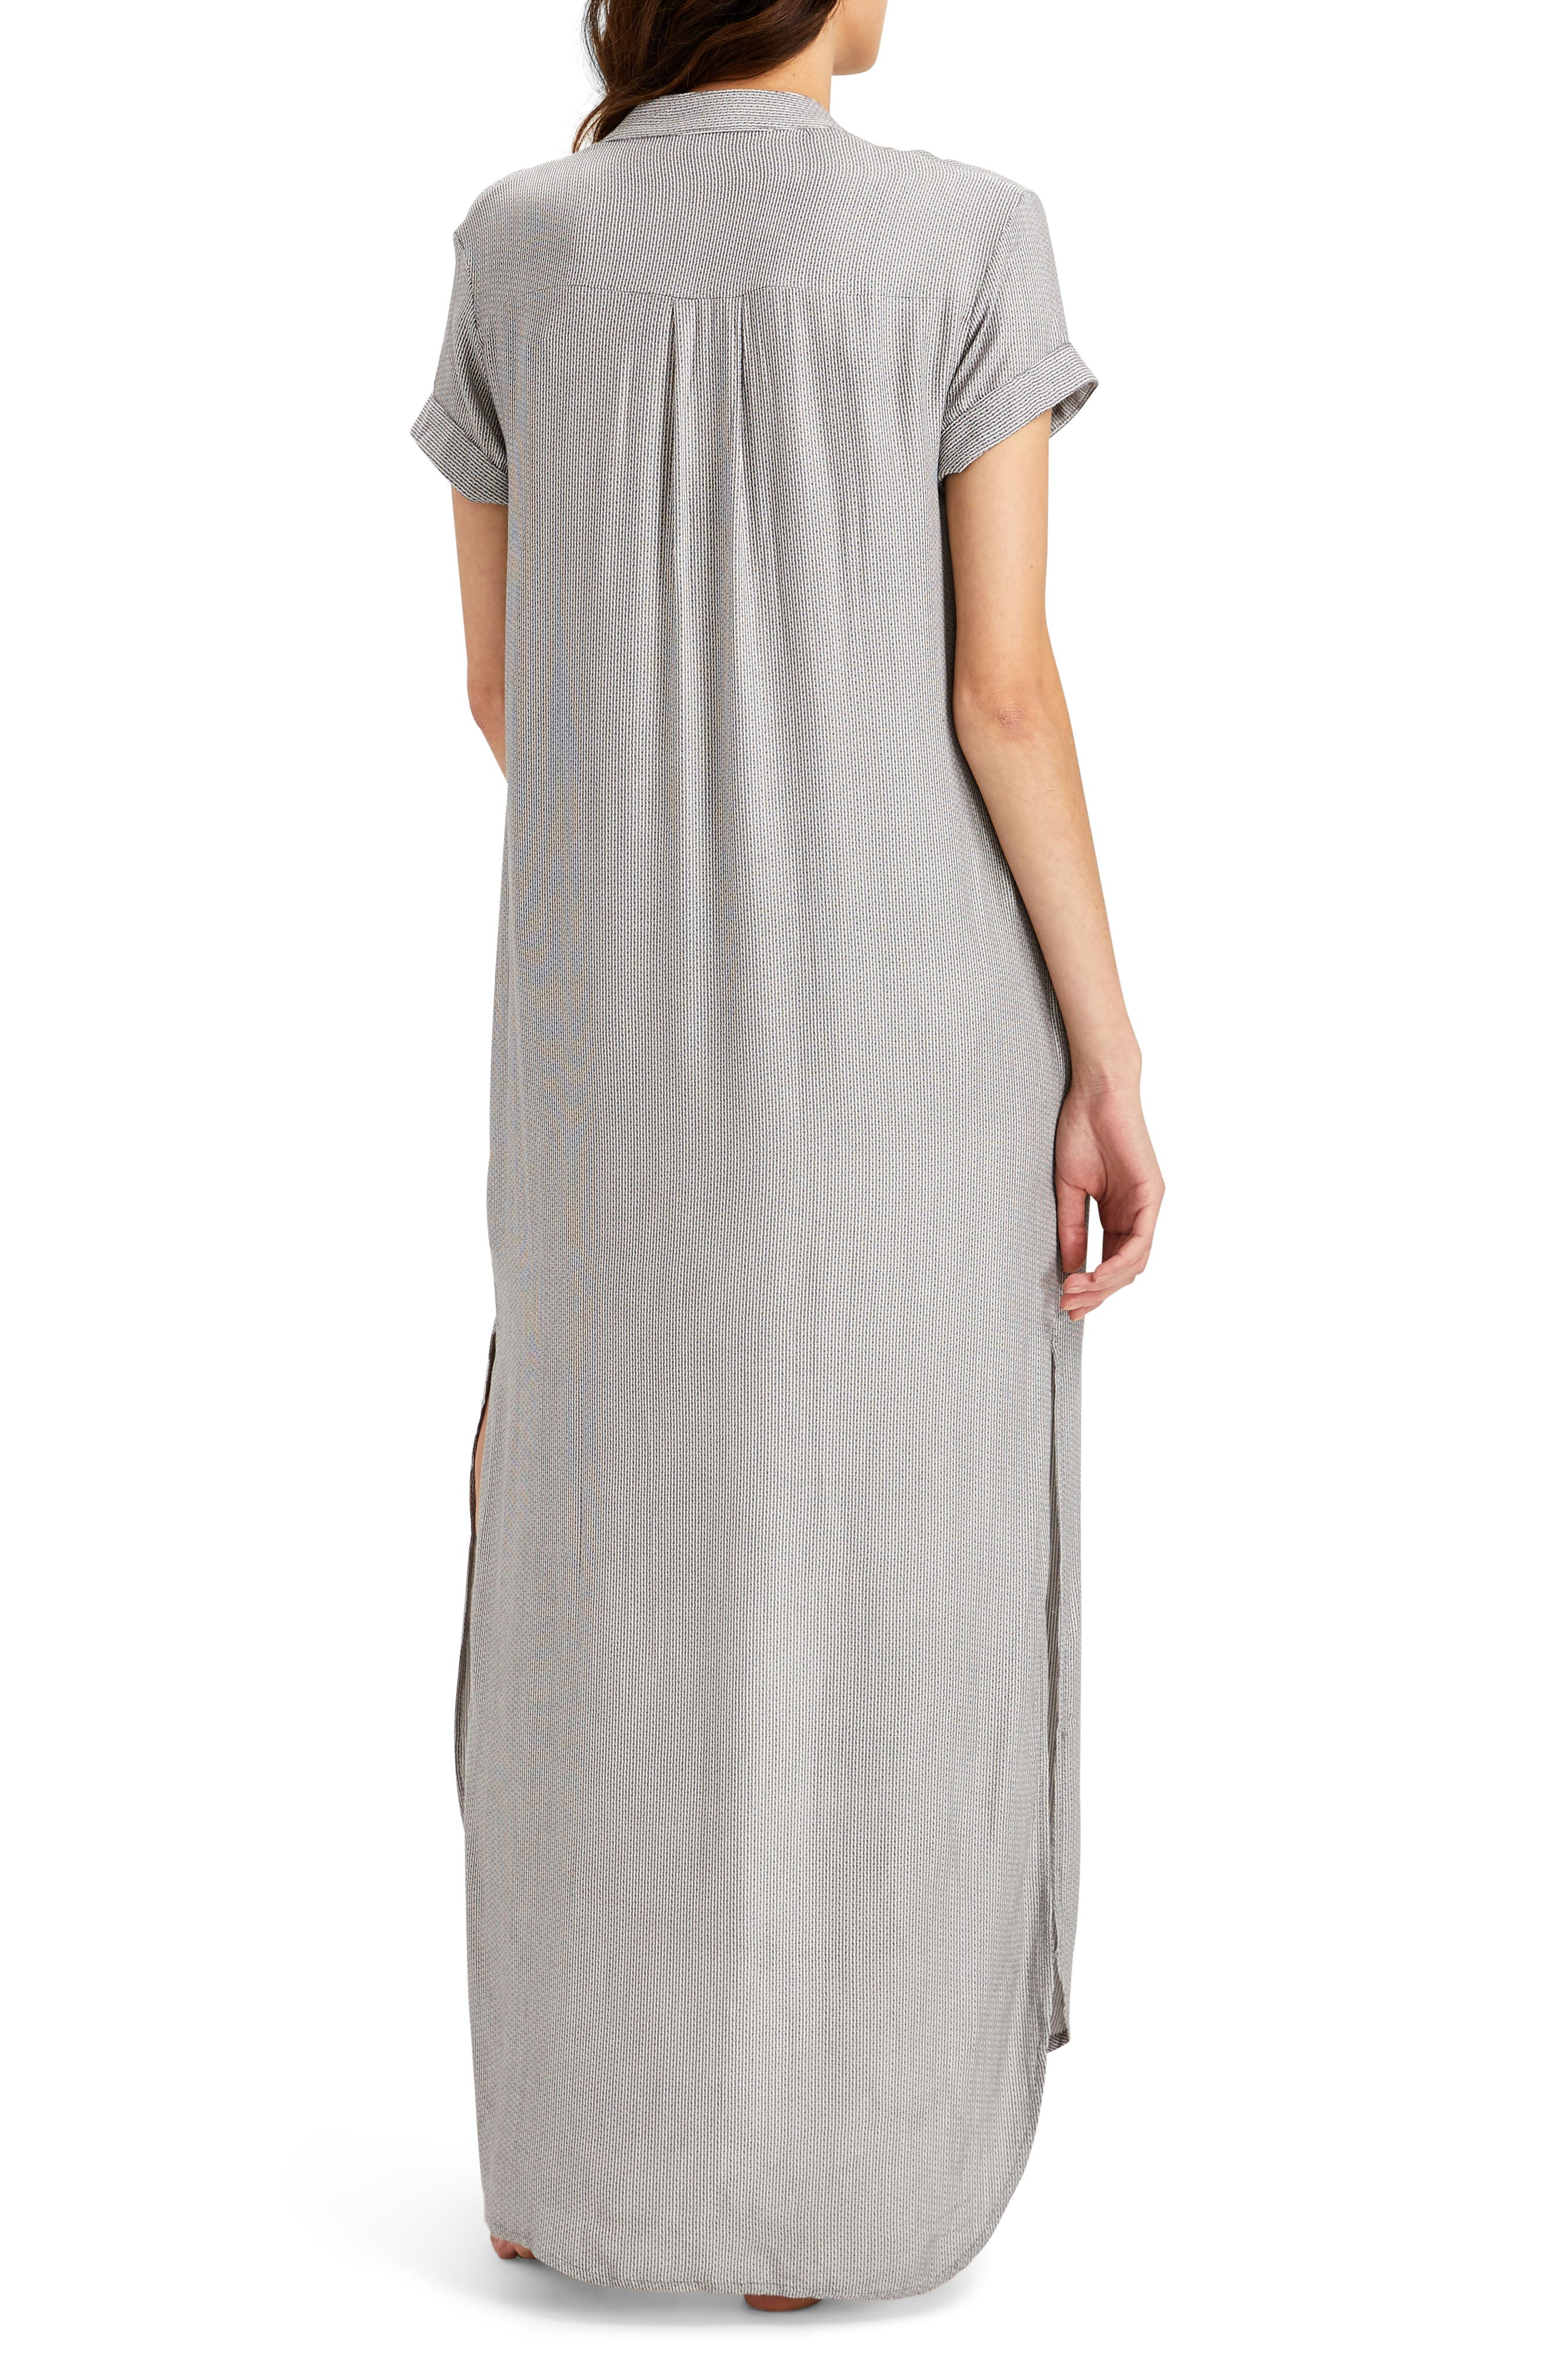 Kim Button Down Cover-Up Dress,                             Alternate thumbnail 2, color,                             022